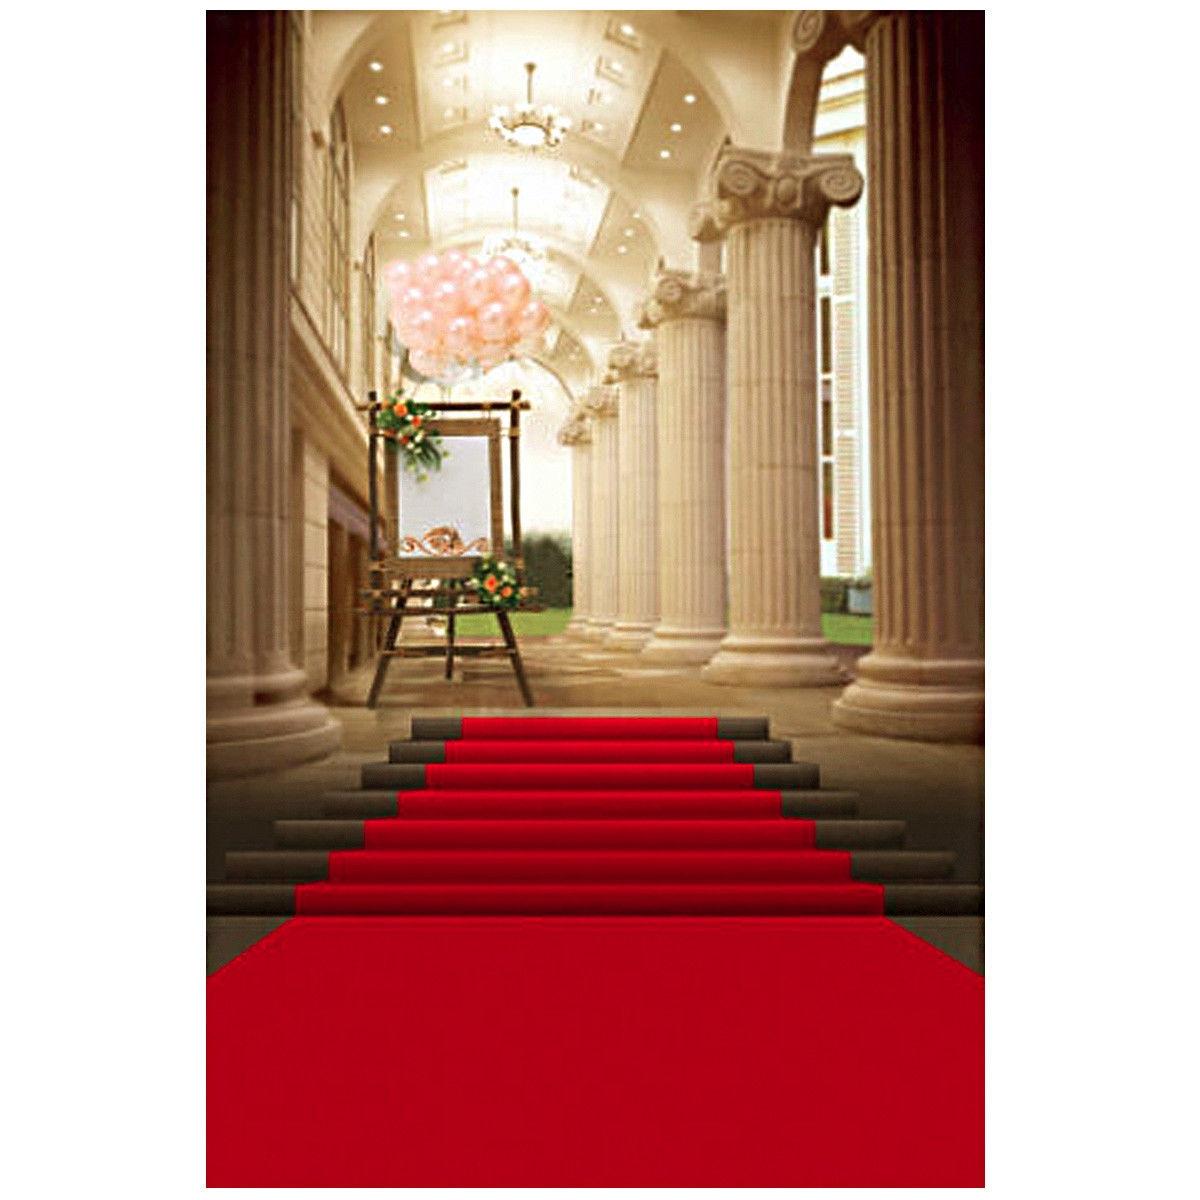 Universal 5x7ft European Palace Red Carpet Wedding Photography Background Studio Backdrop